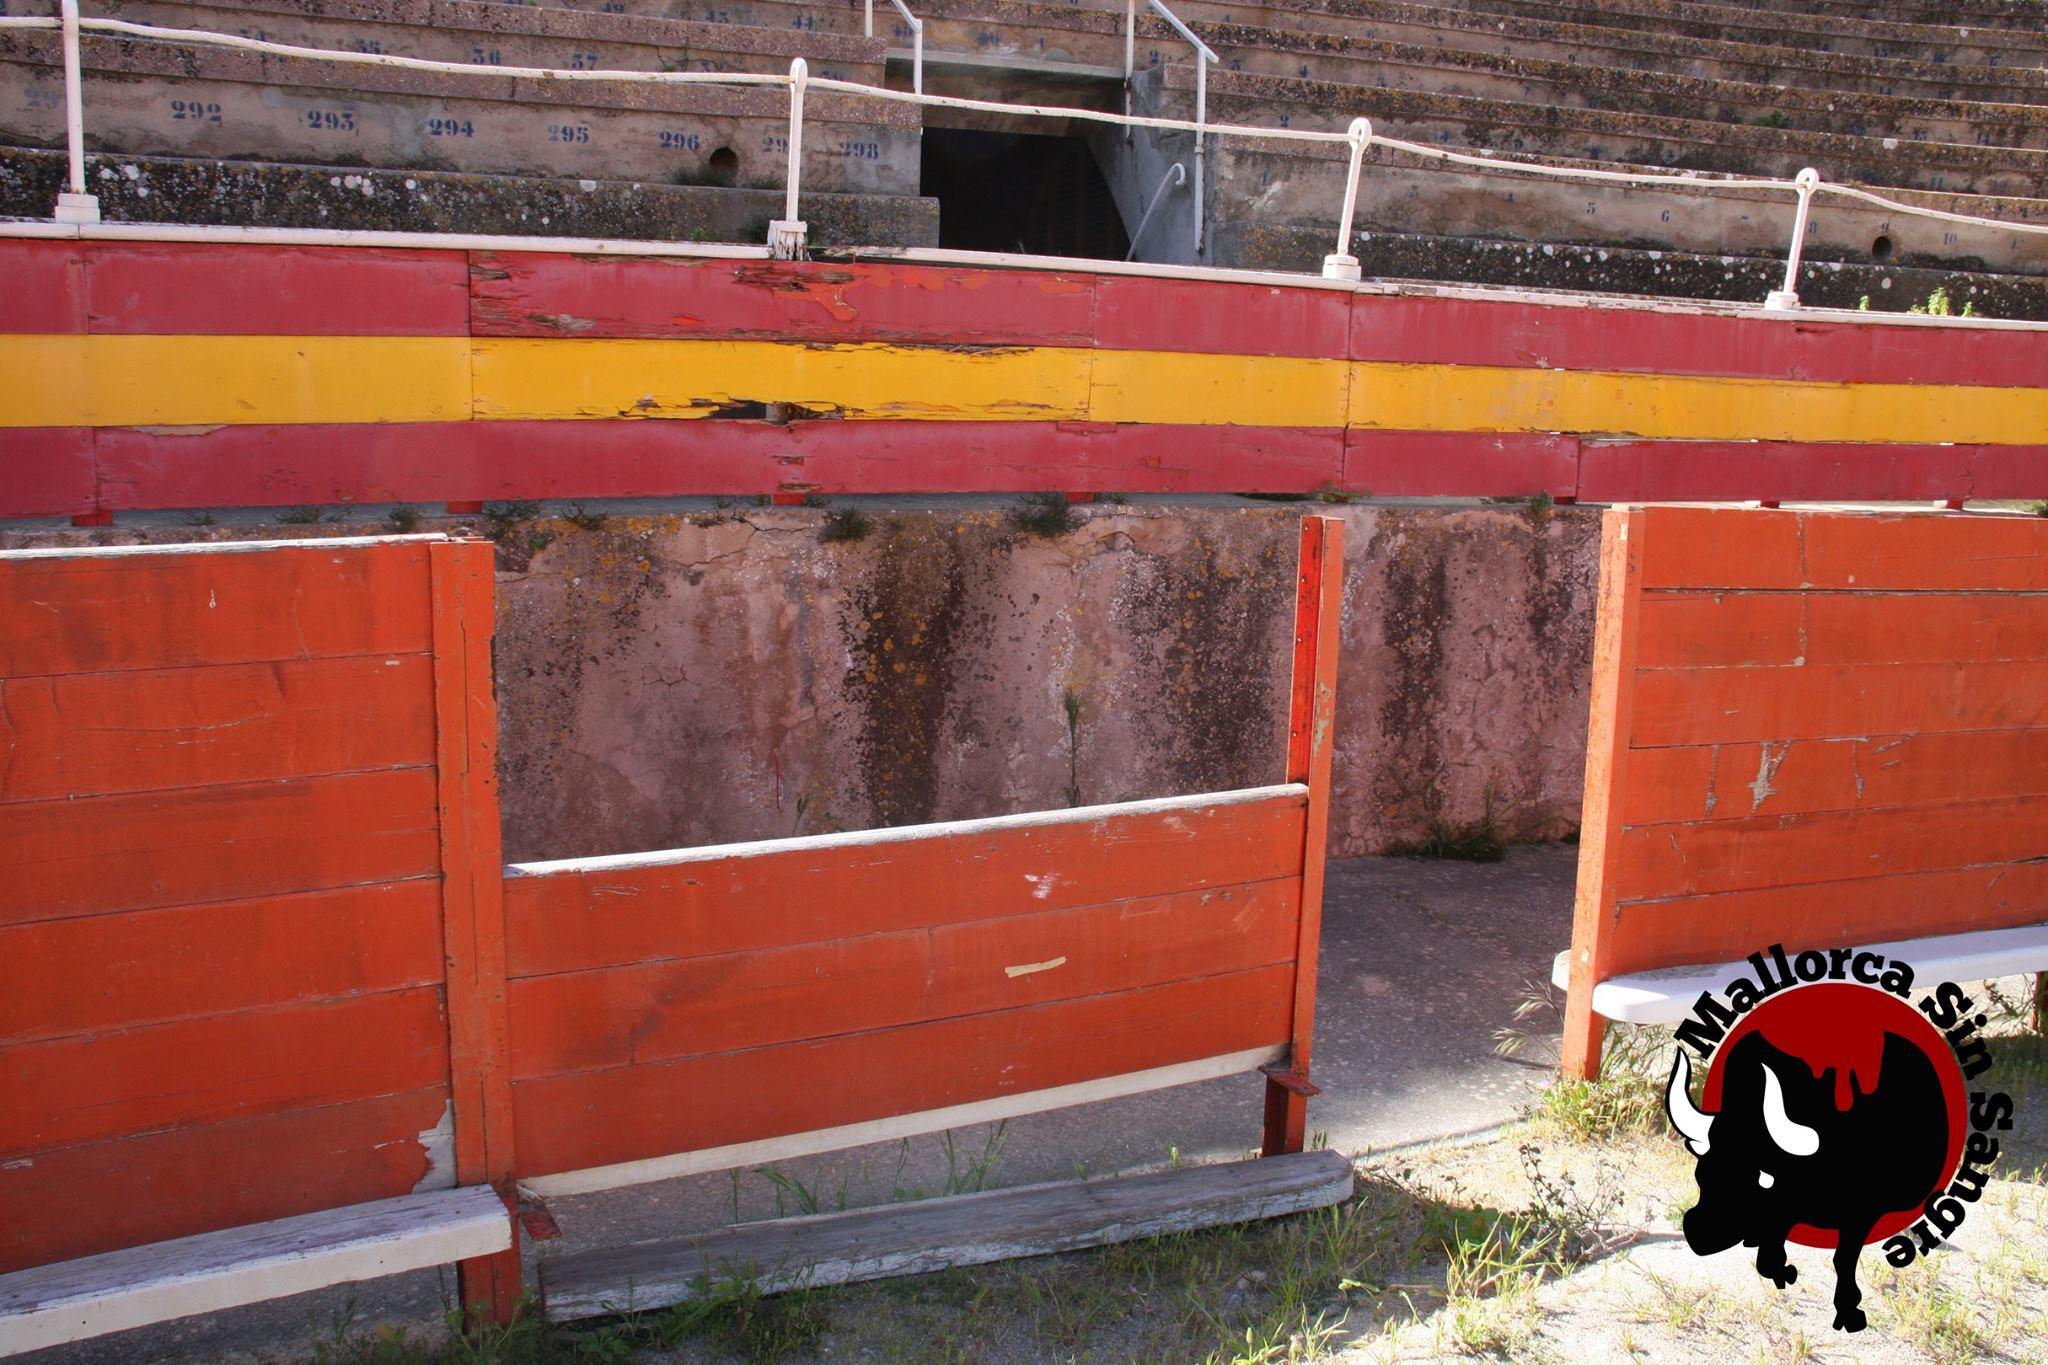 Mallorca Sense Sang lamenta que se pongan vidas humanas en juego por el estado de la plaza de toros de Palma de Mallorca